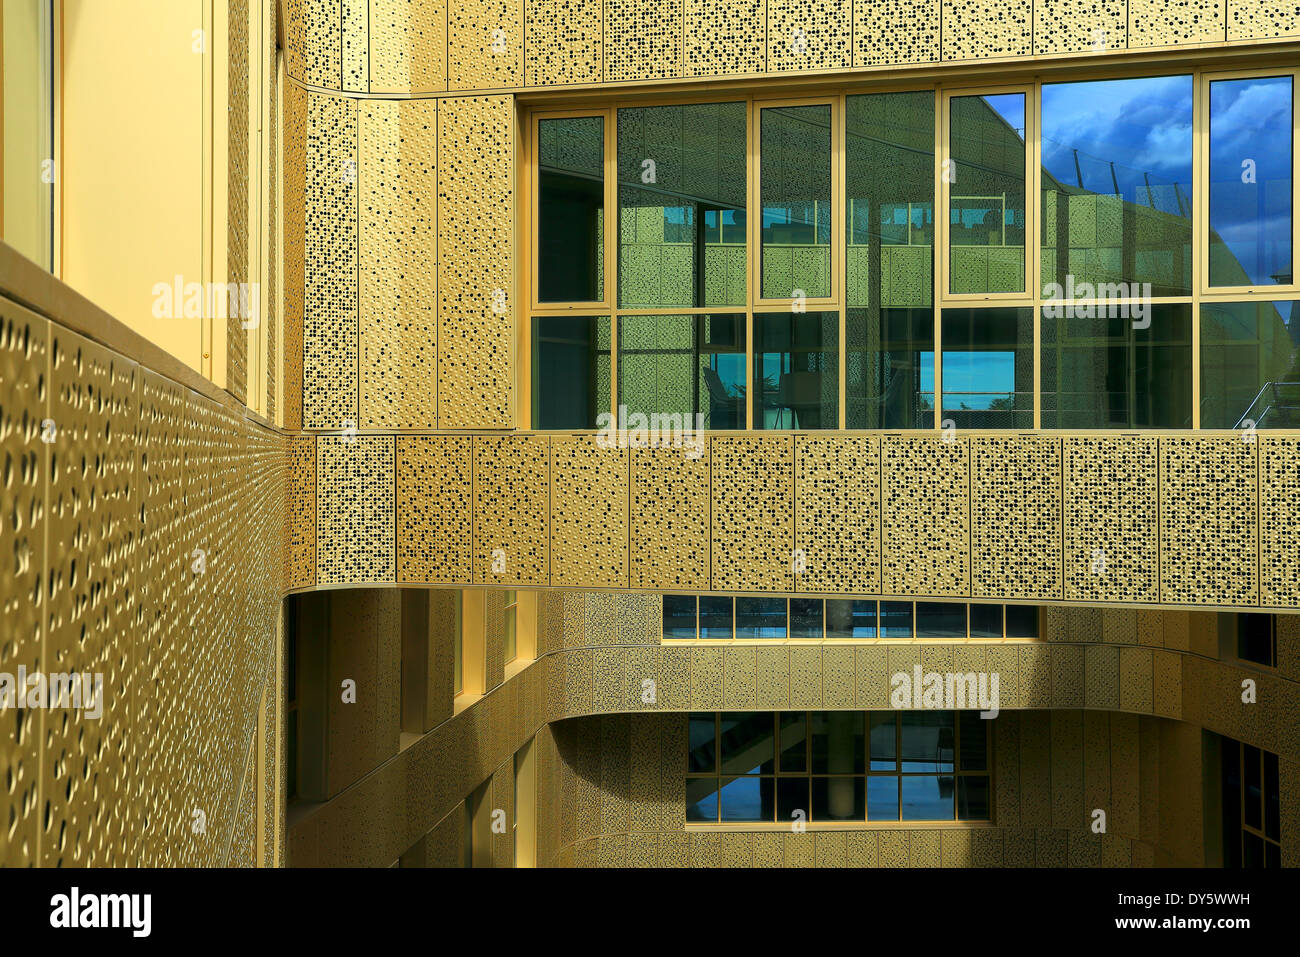 Culinary center-Donostia - Stock Image